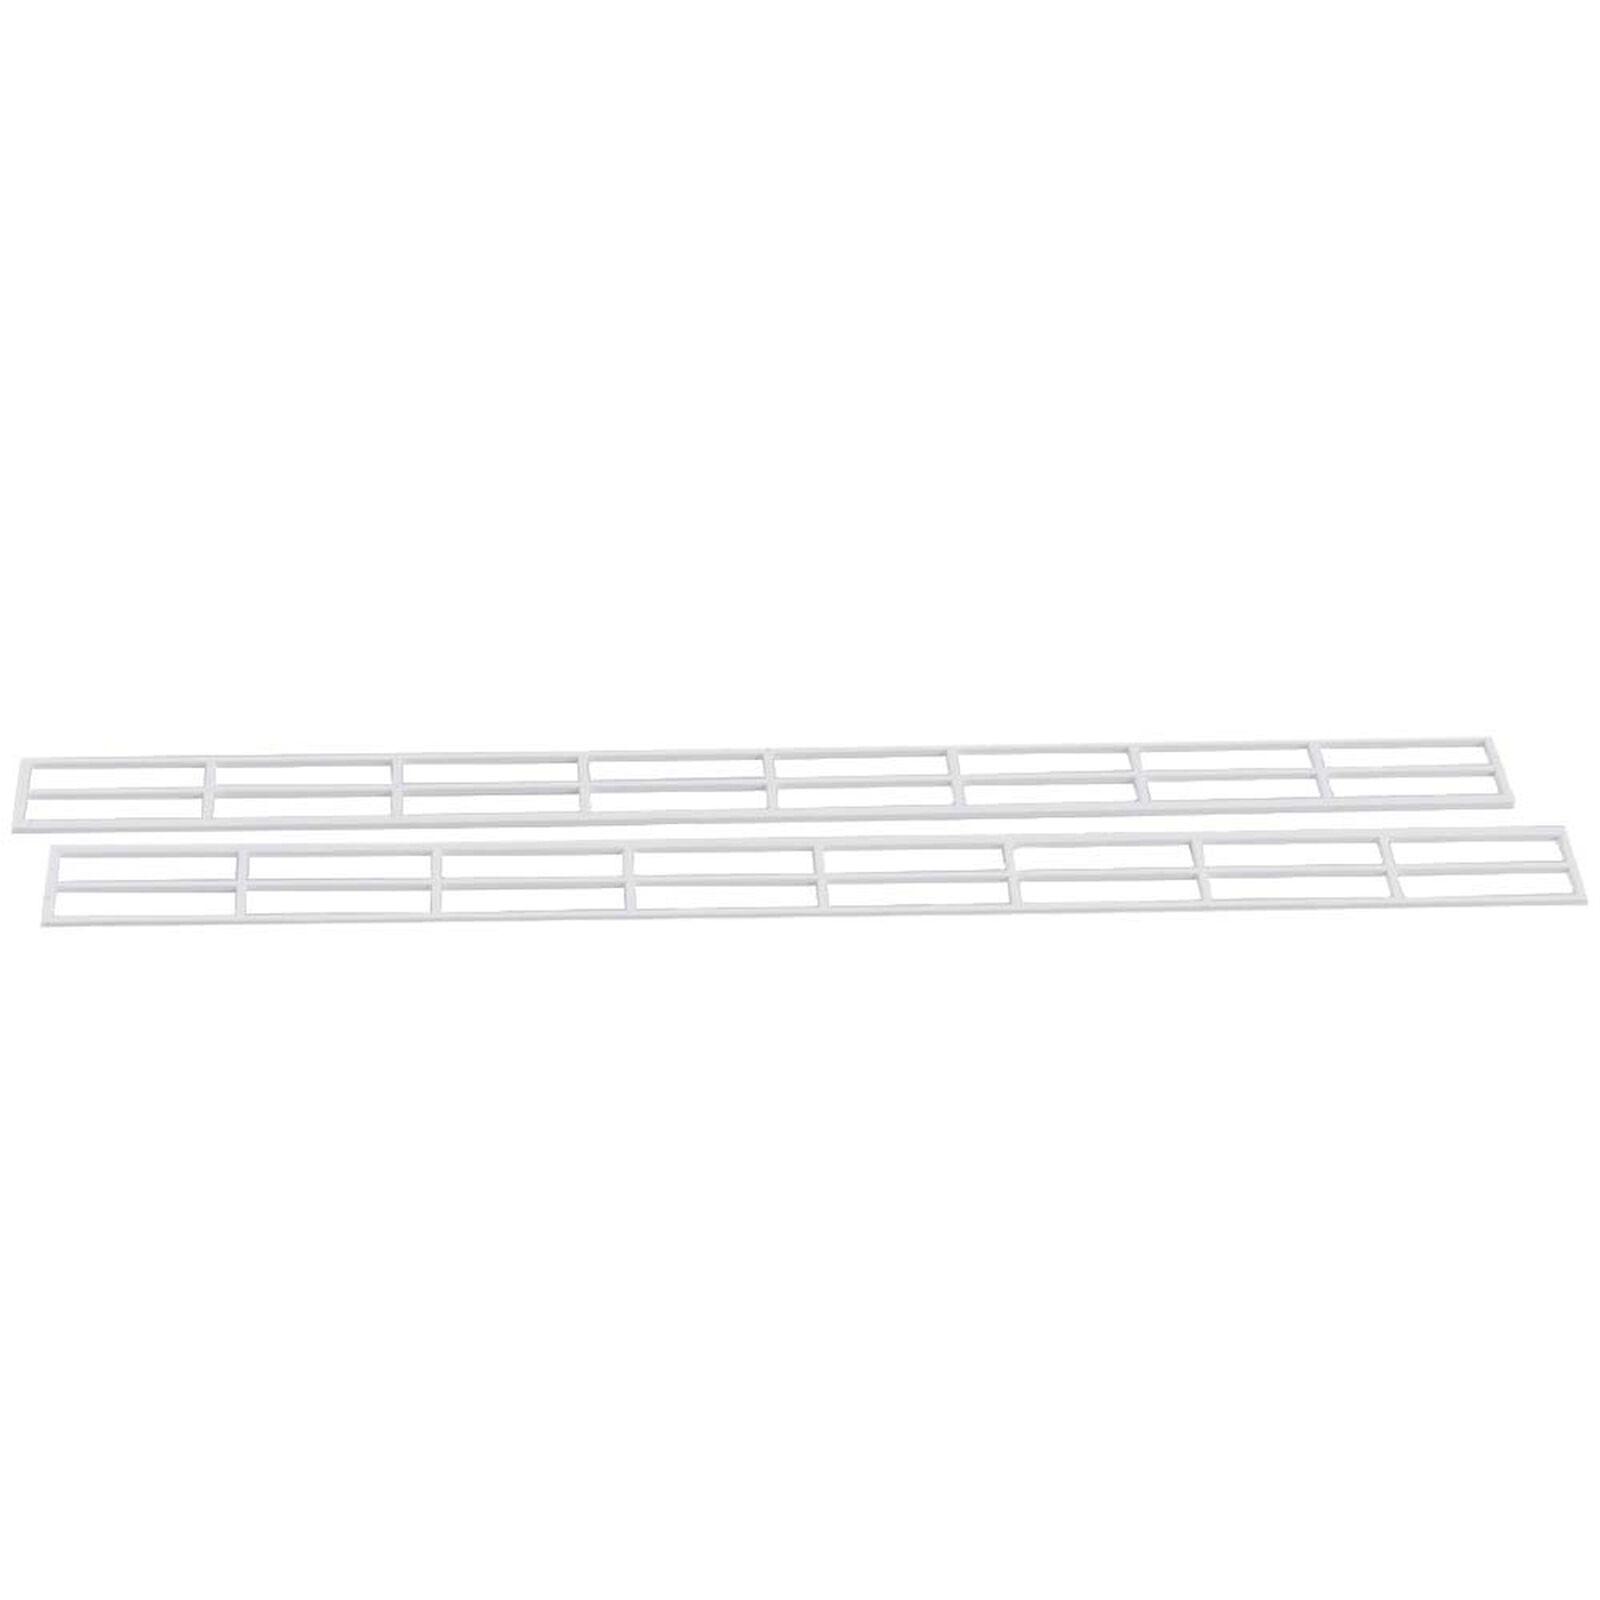 HRS-4 HO Handrail (2)